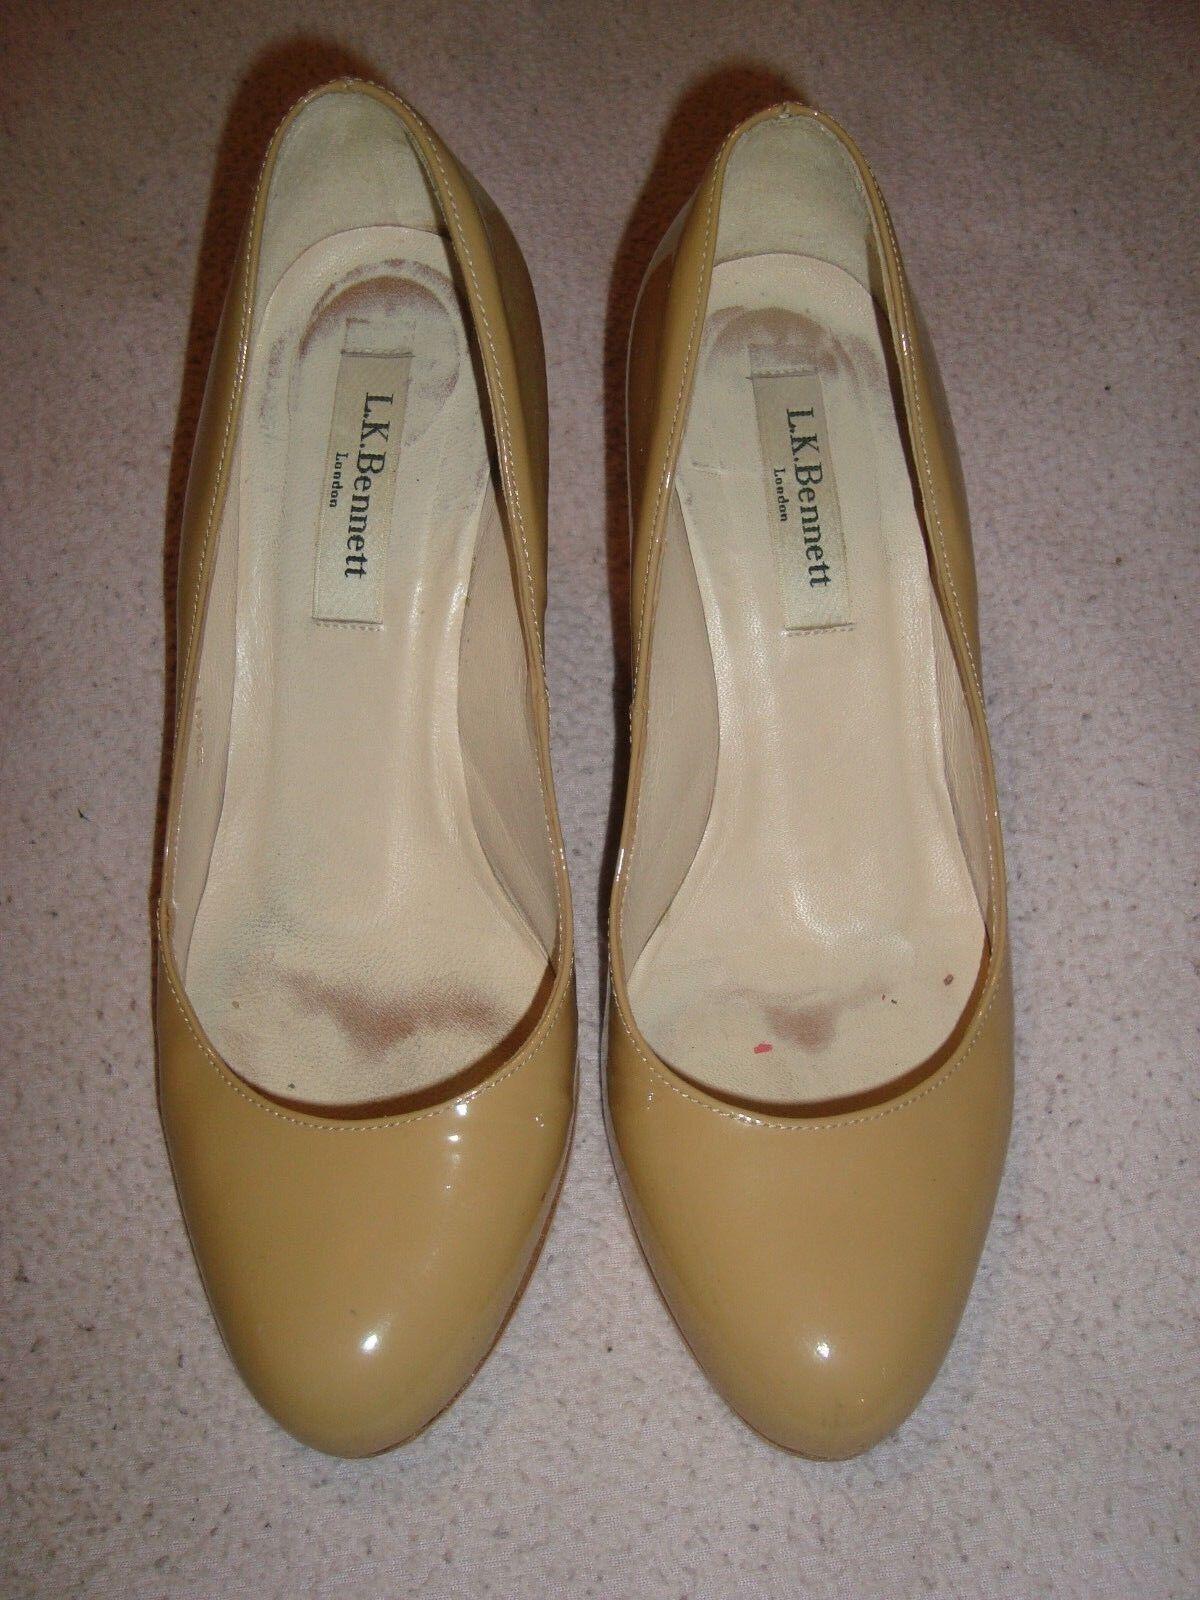 L.K.Bennett UK 3 EU 36 Beige Patent Leder Schuhes